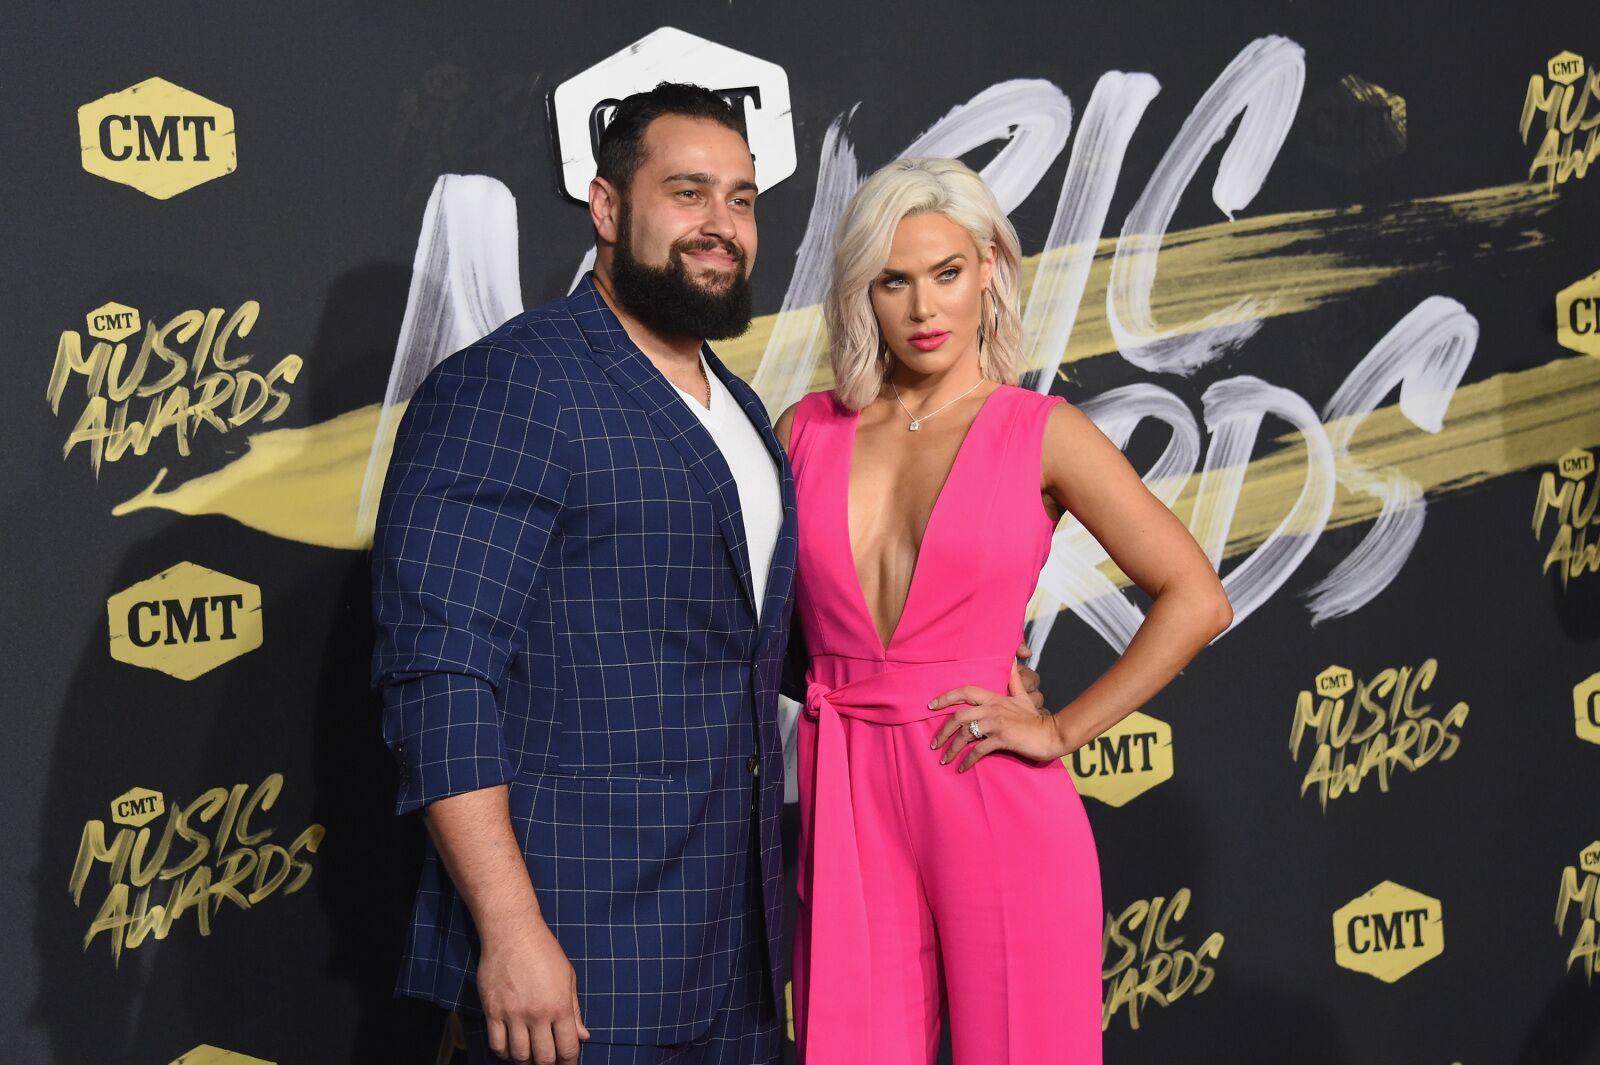 Rusev is back on WWE TV: Five feuds for The Bulgarian Brute